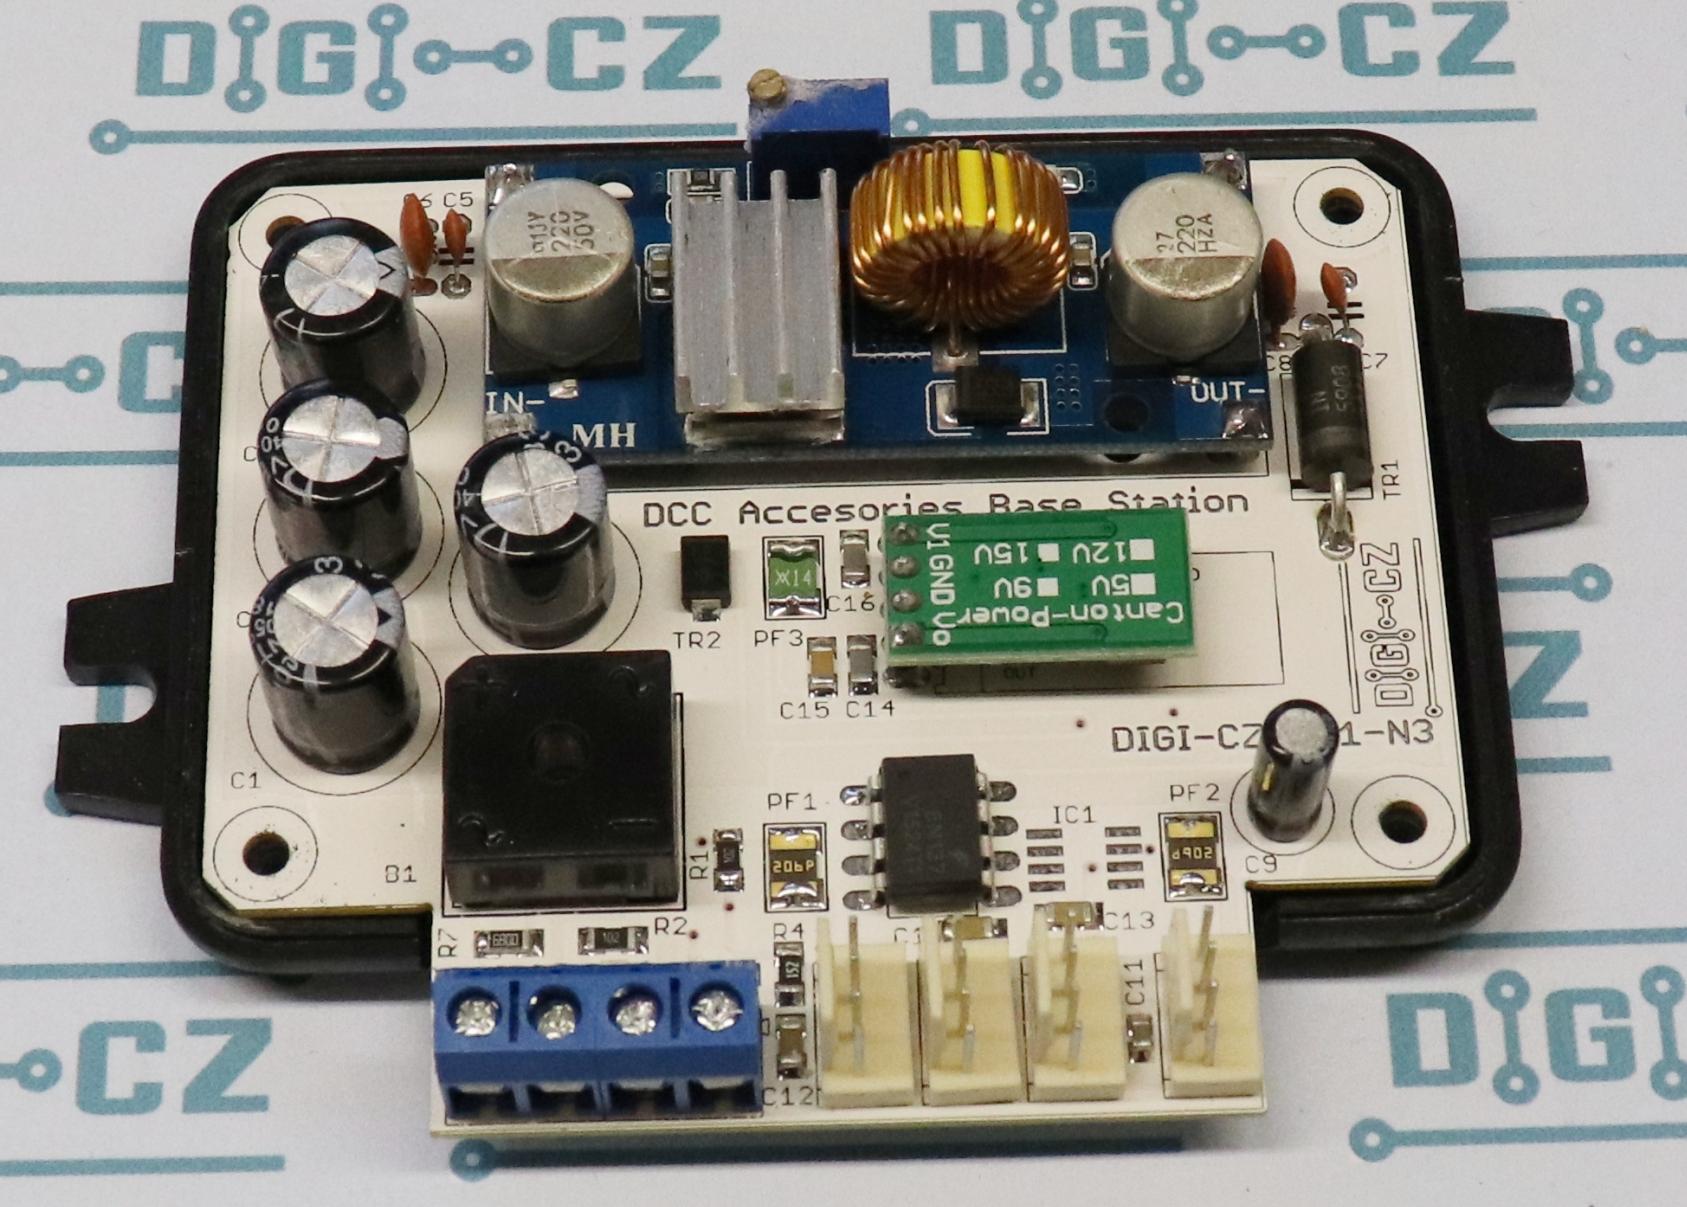 DIGI-CZ-221-N3